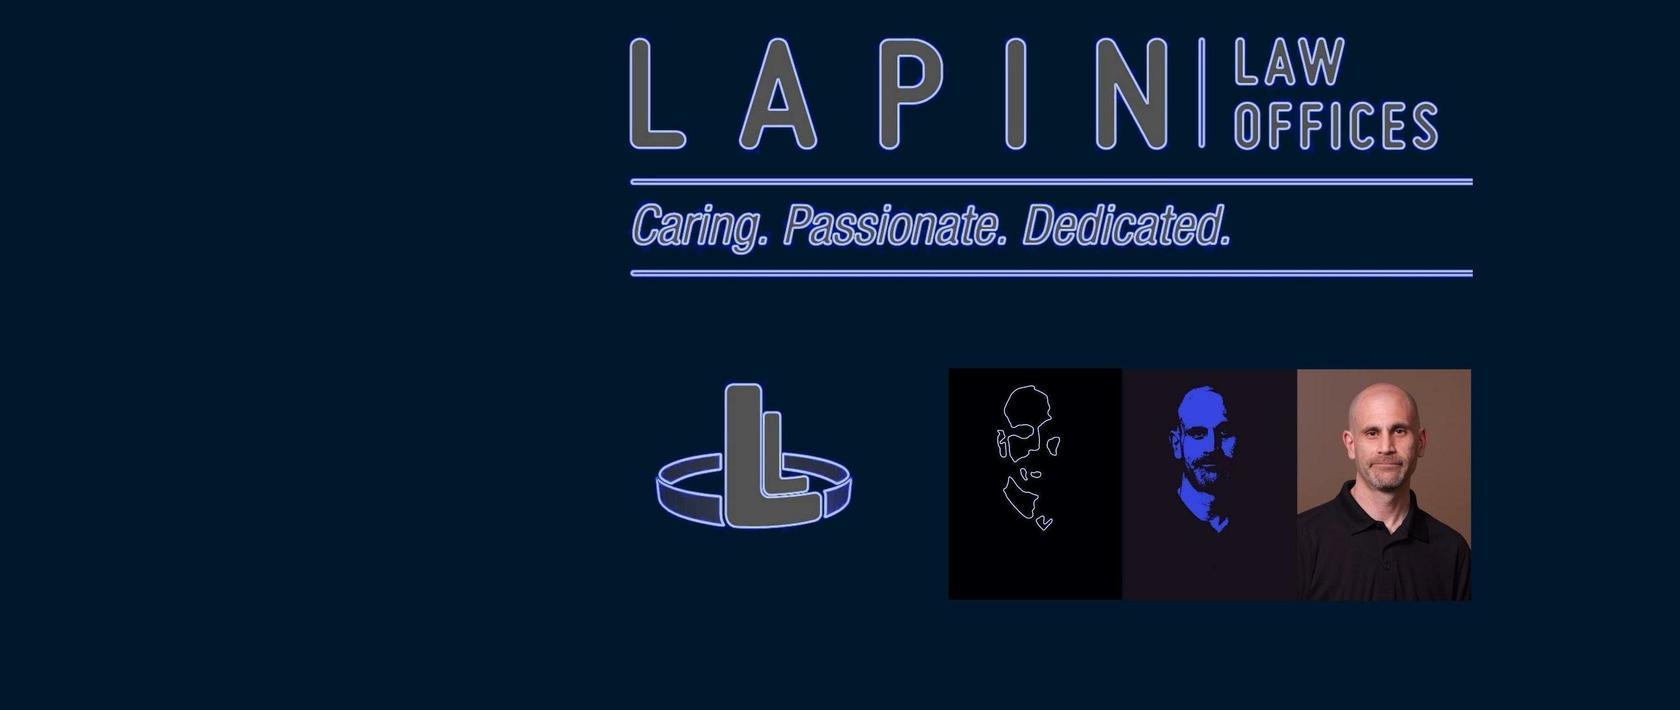 Jeffrey Lapin